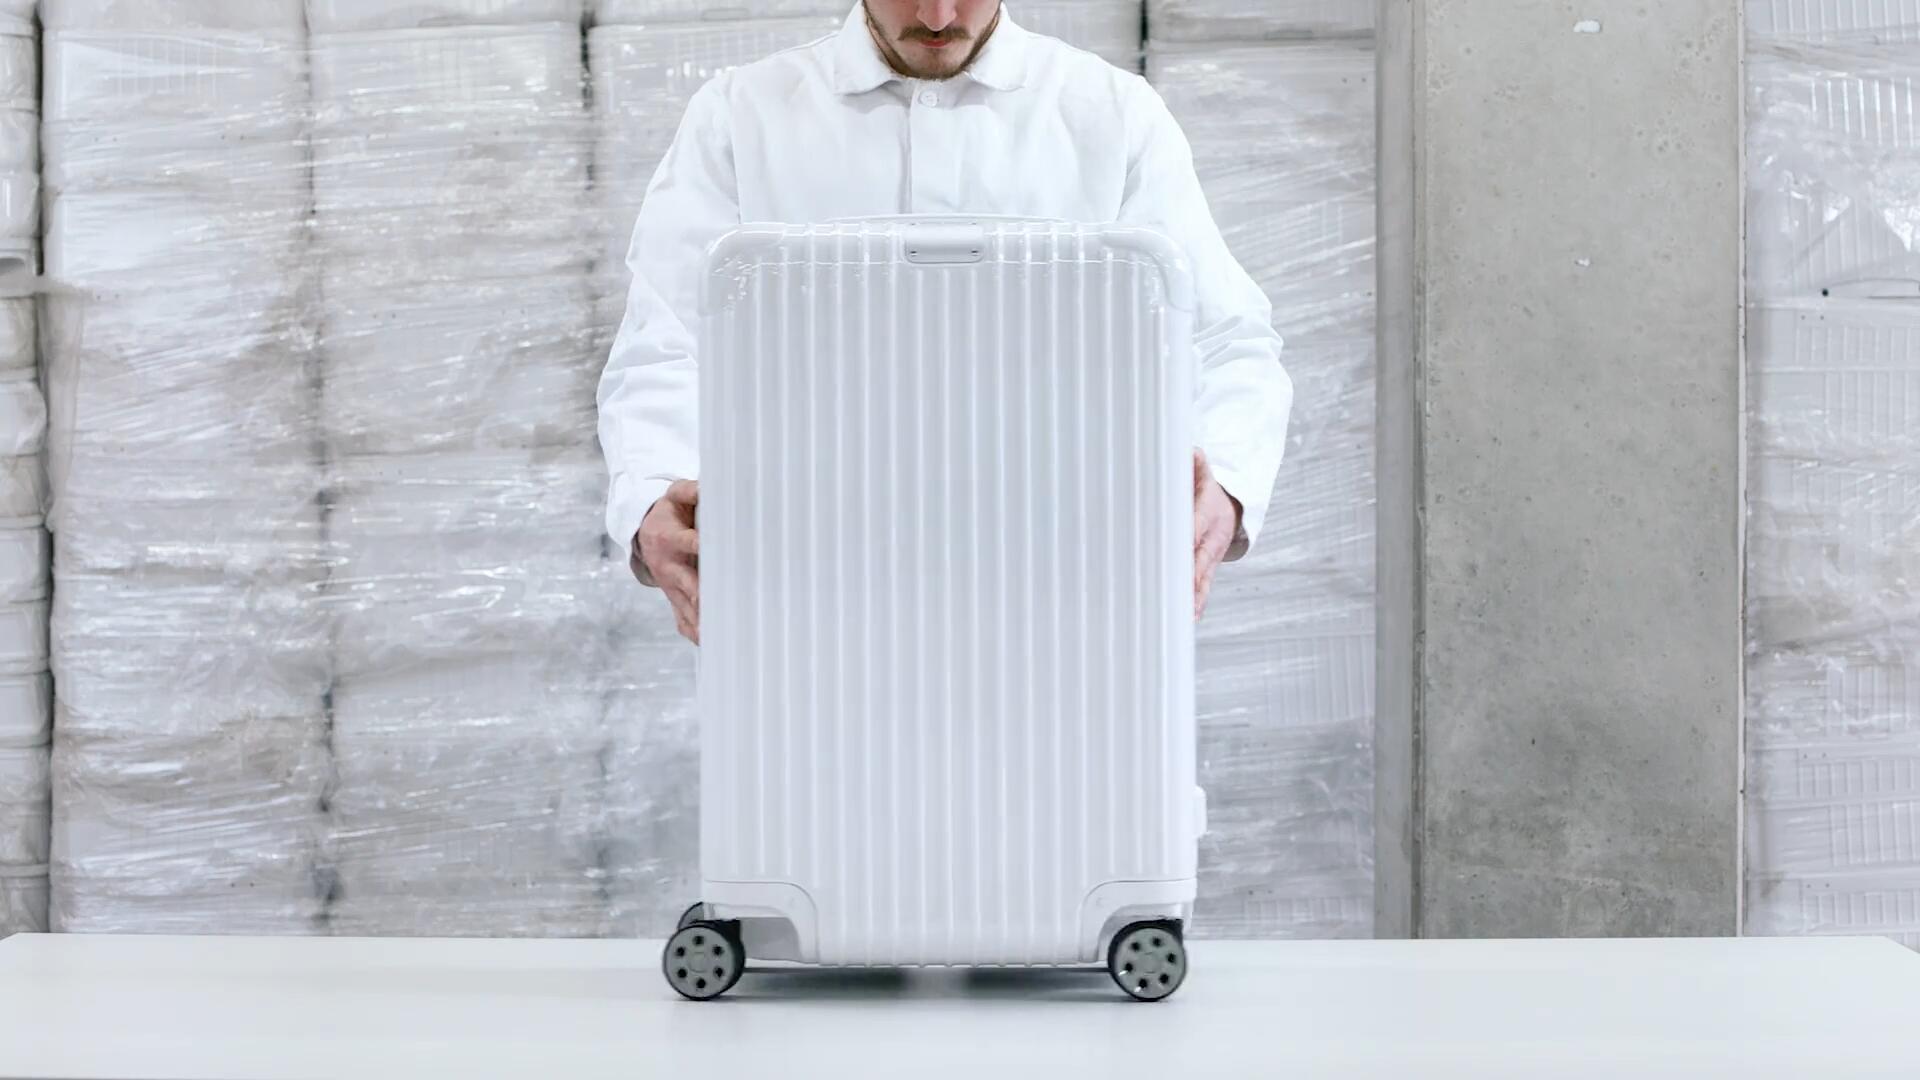 《Factory_Polycarbonate》RIMOWA 新系列旅行箱广告